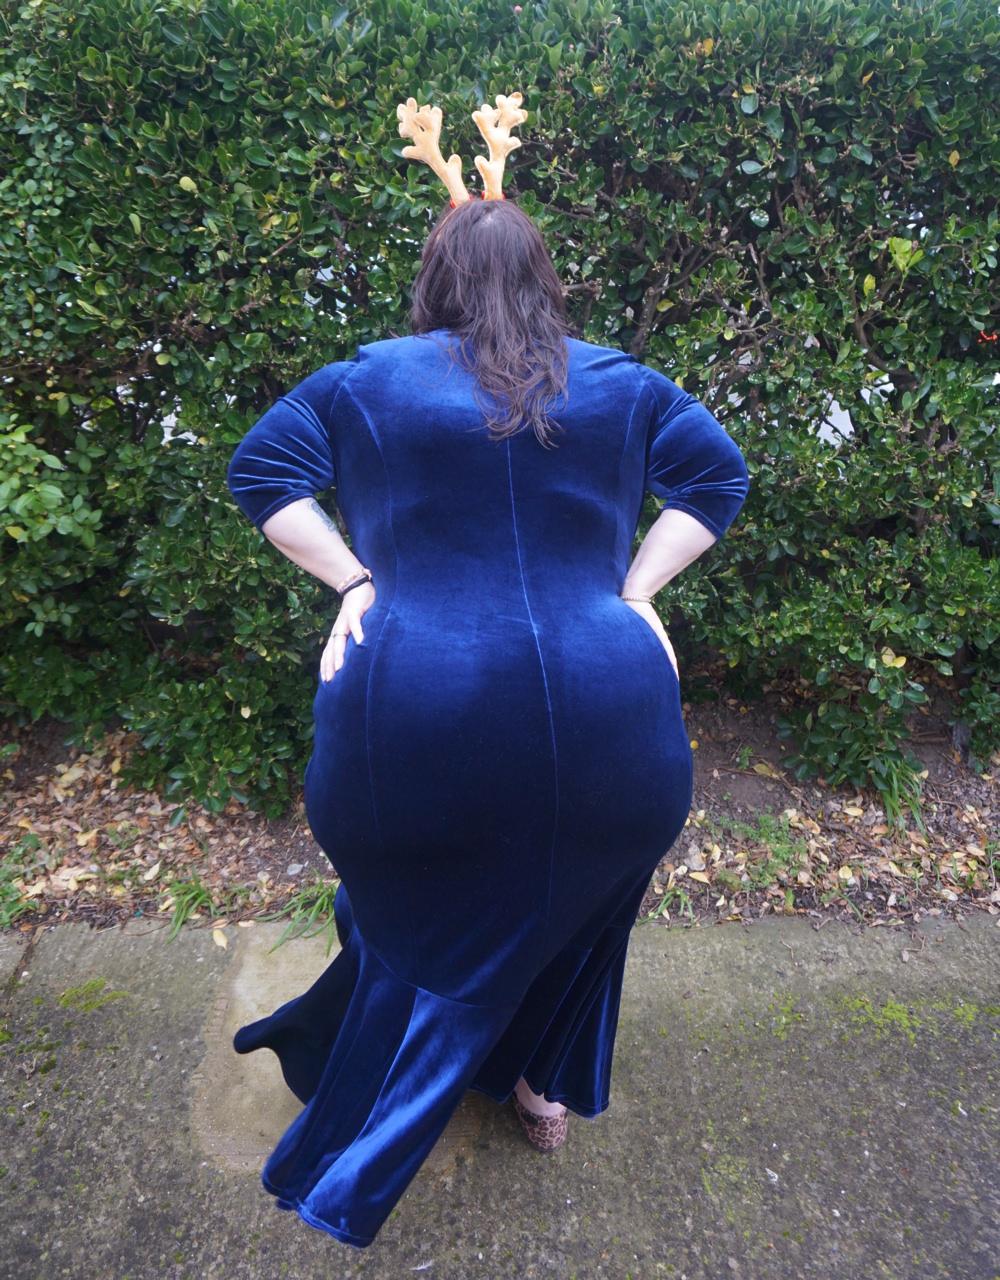 Scarlett and Jo Fishtail Velvet Maxi Dress in Midnight, deep navy plus size dress, plus size occasion dress, plus size Christmas dress, plus size party dress, plus size ball gown, plus size white tie event, races, Ascot, plus size award ceremony dress, plus size velvet dress